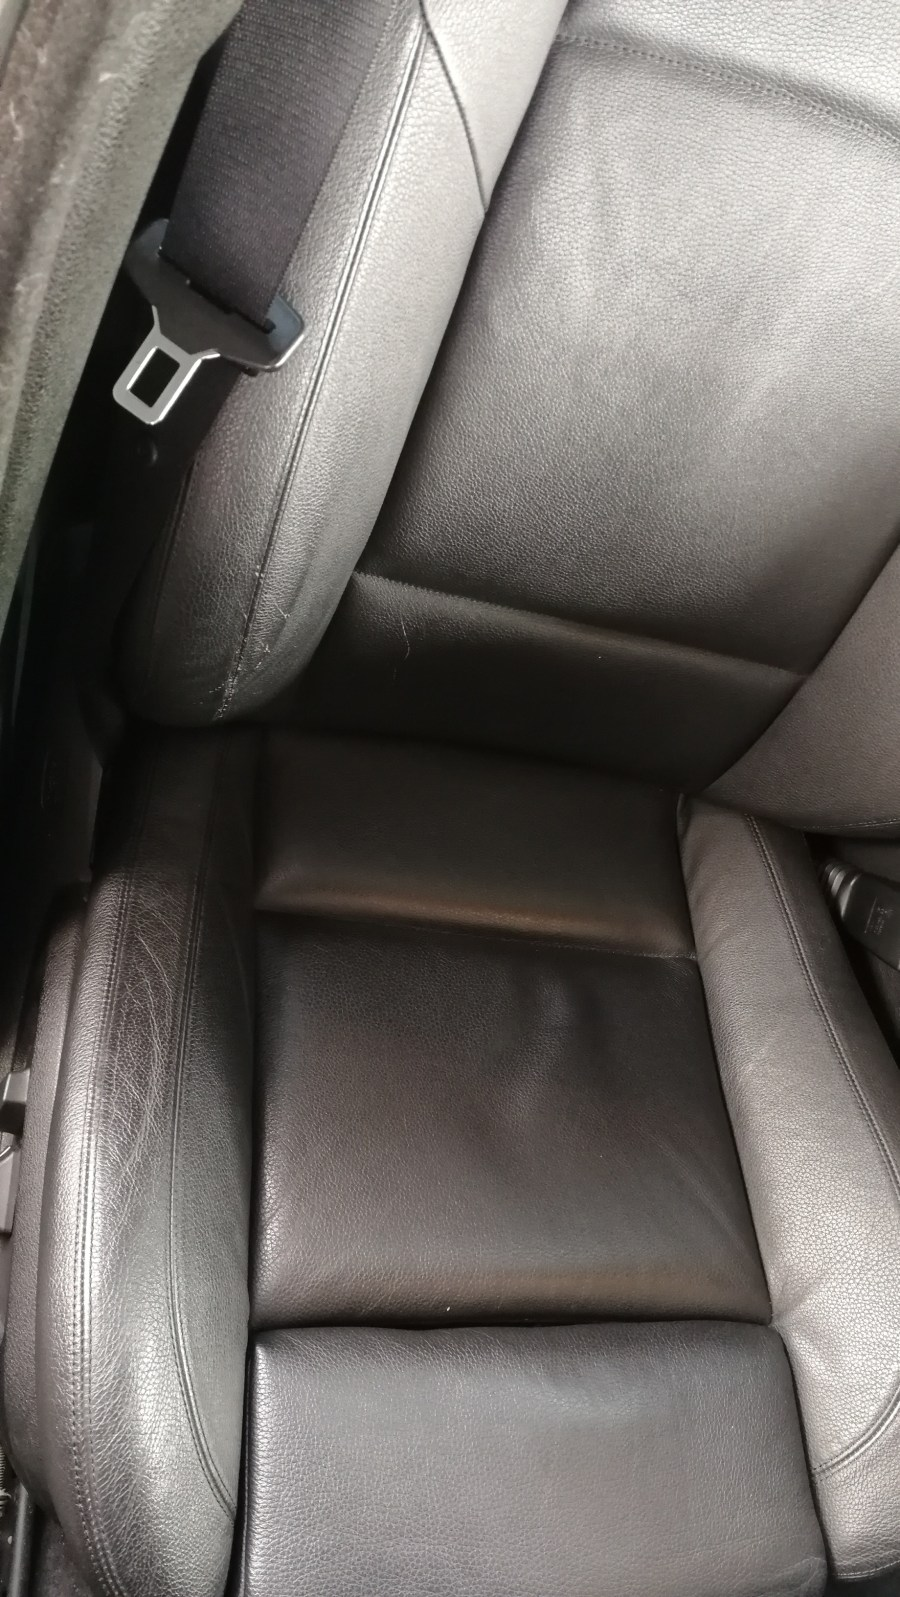 BMW 523d シート傷補修 ステアリング擦れ補修前